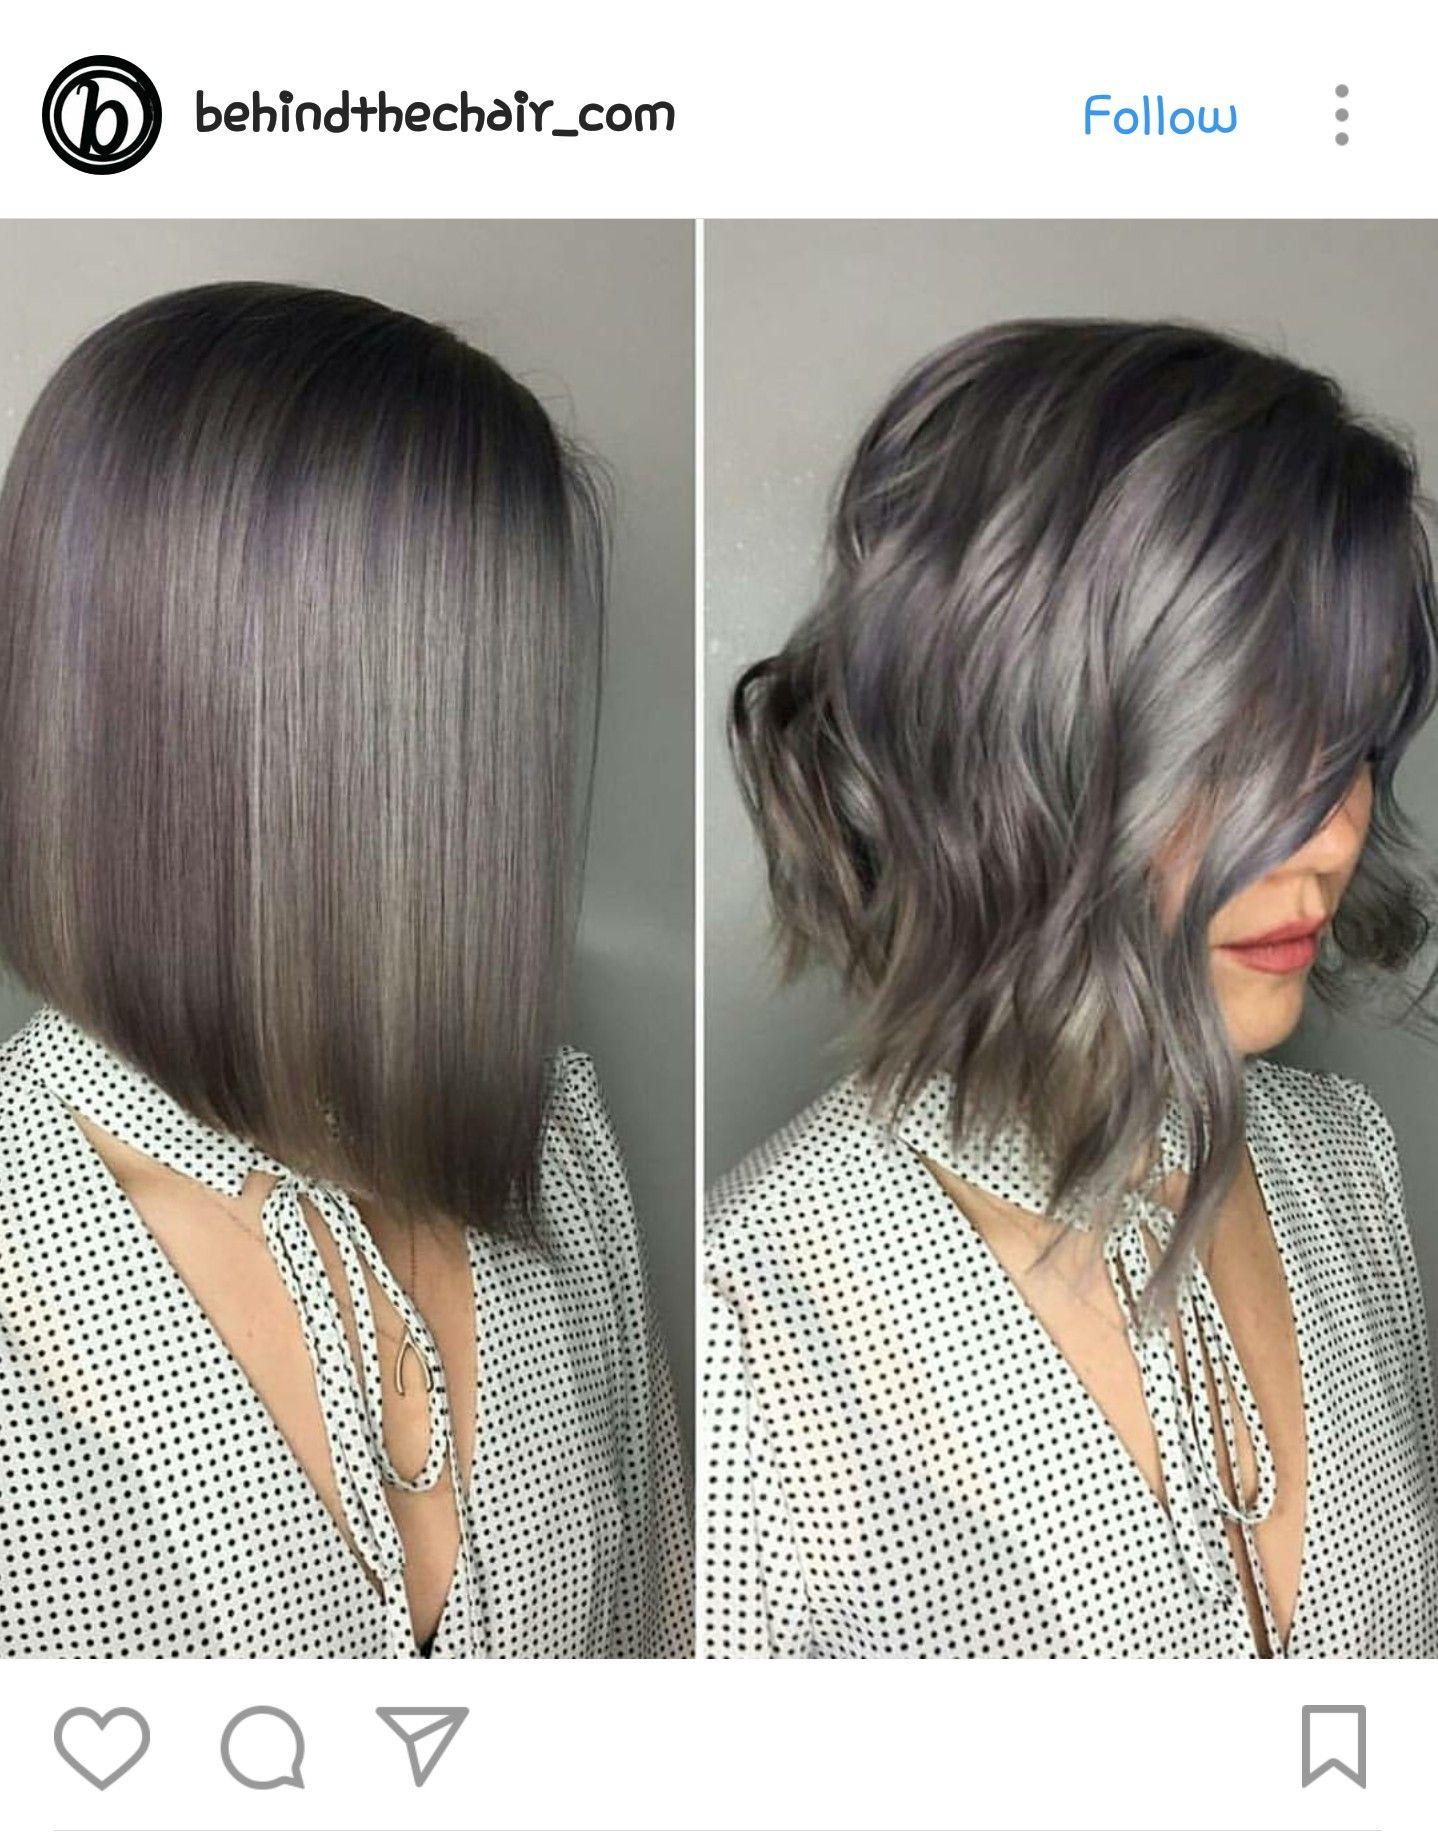 Pin by mireya arguelles on peinados pinterest hair style hair